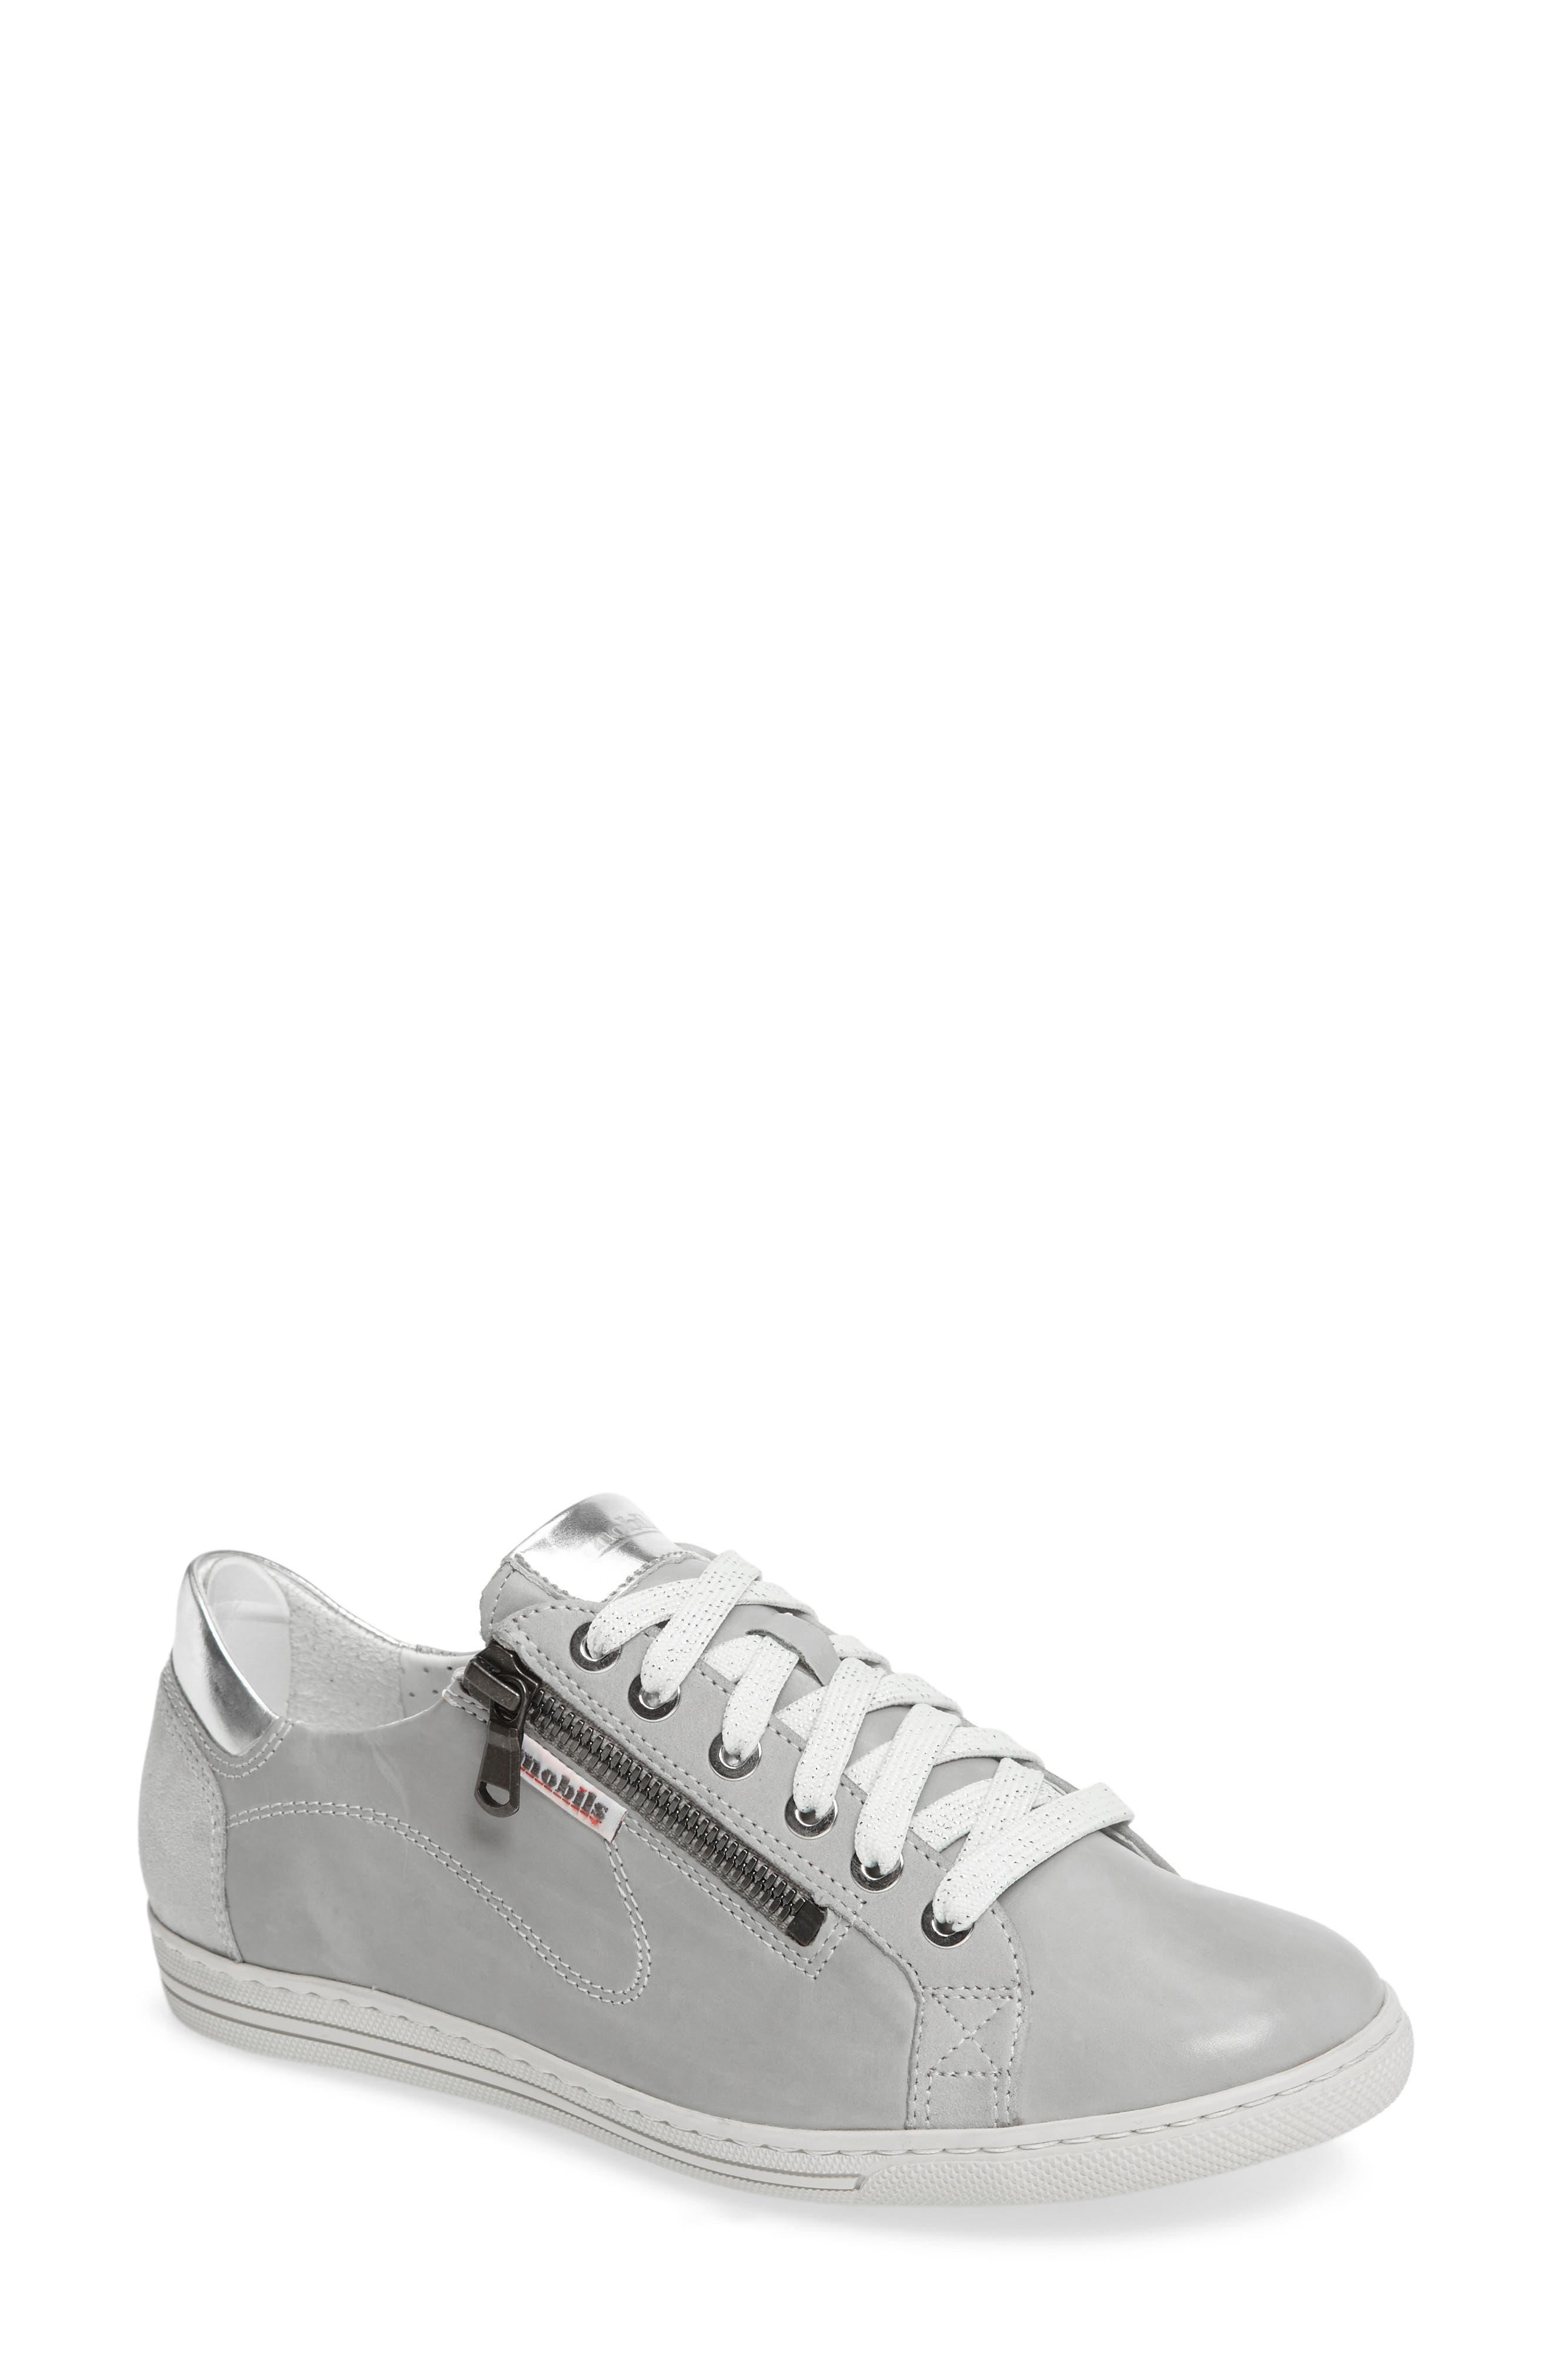 MEPHISTO Hawai Sneaker, Main, color, 056